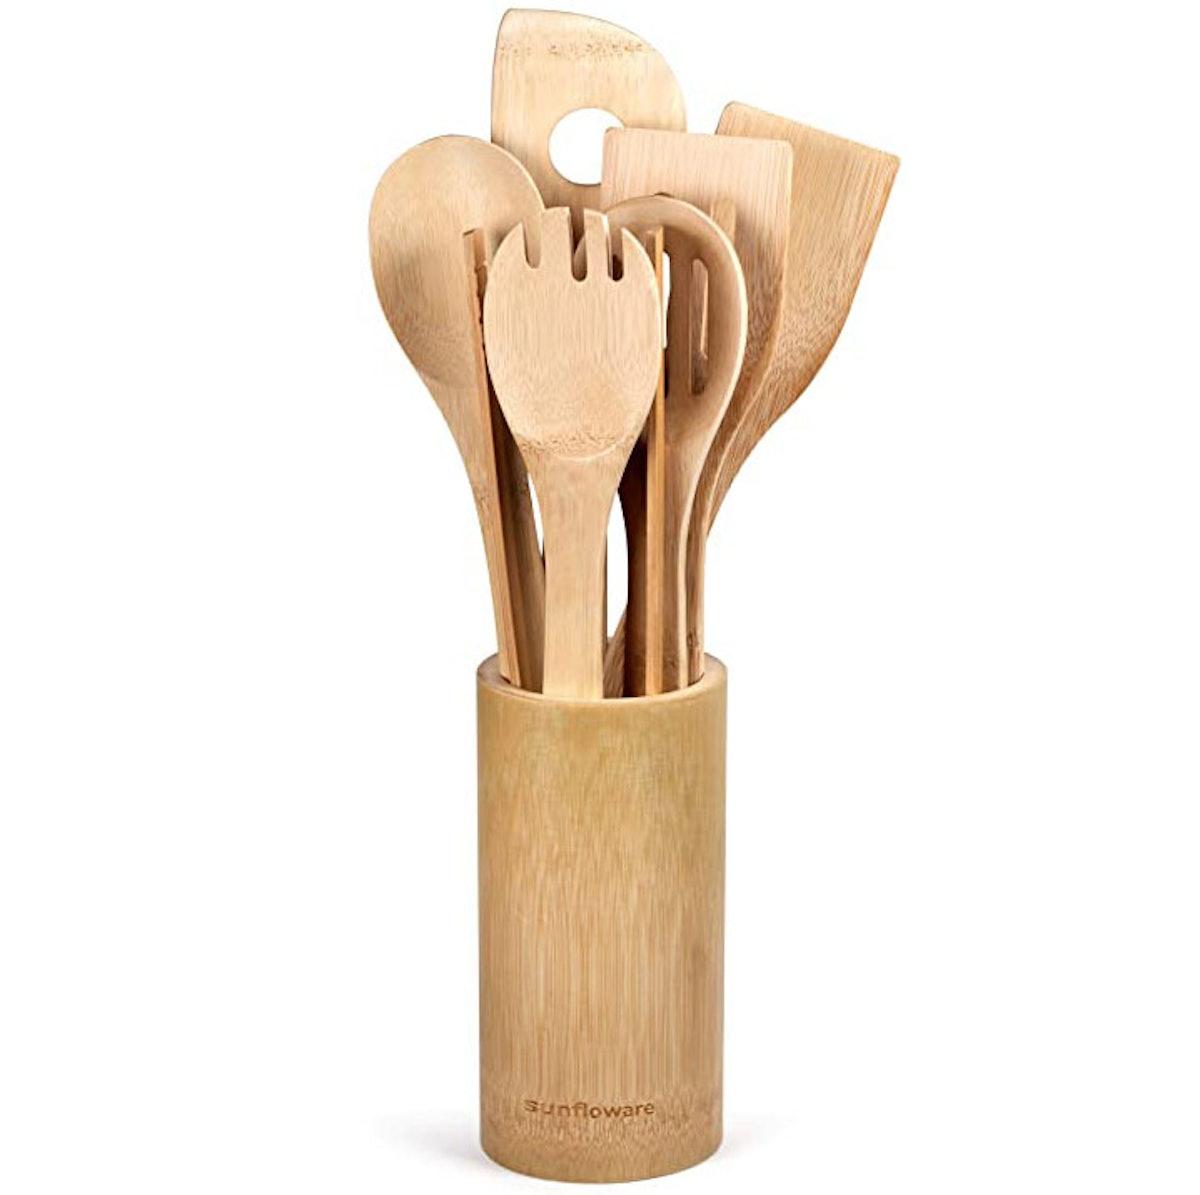 Sunfloware Wooden Bamboo Cooking Utensils Set (8pcs)